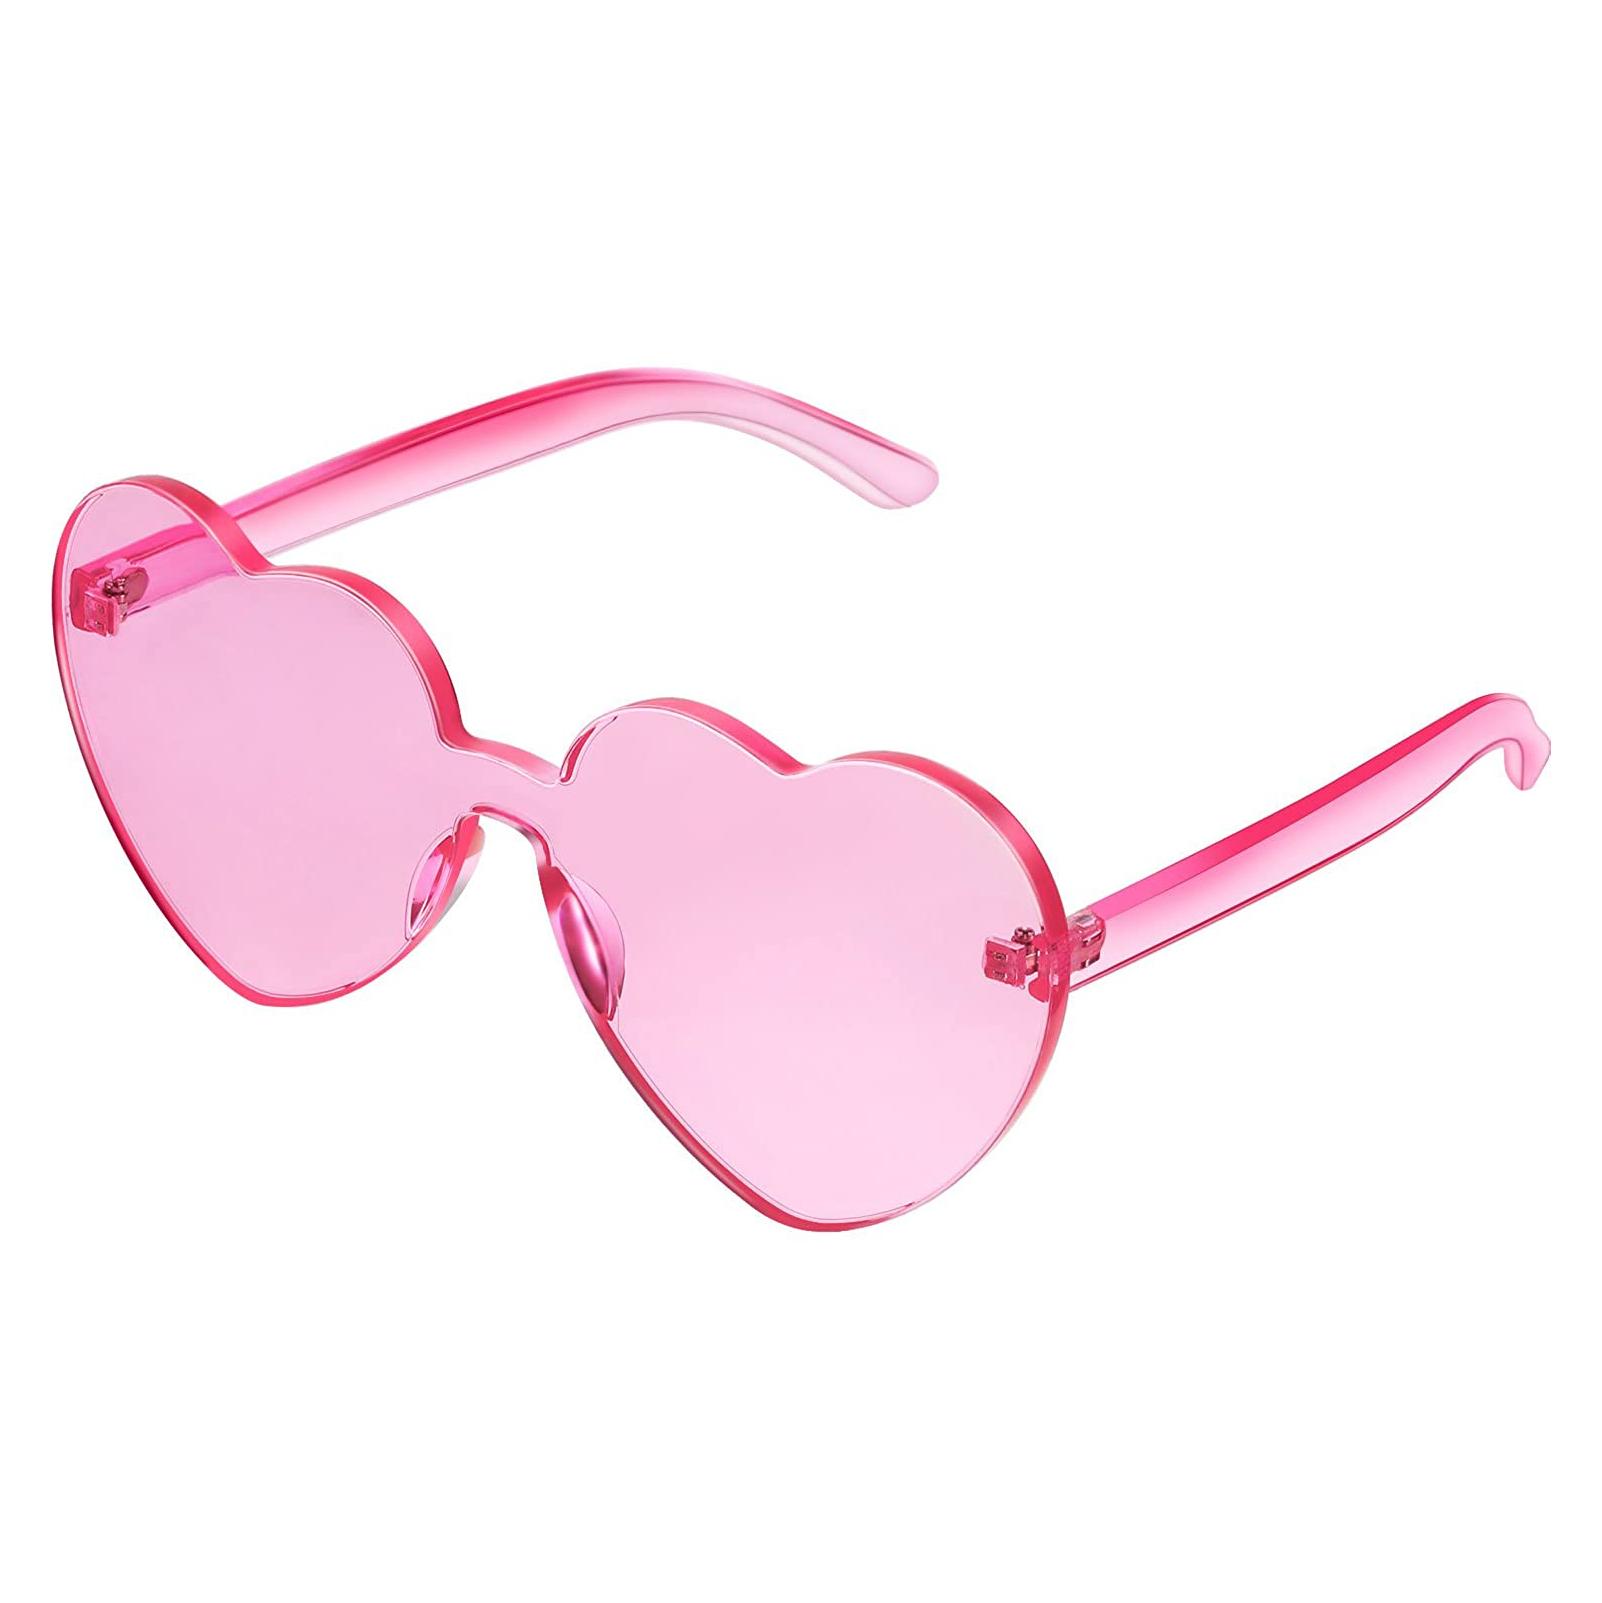 Maxdot Heart Shape Sunglasses